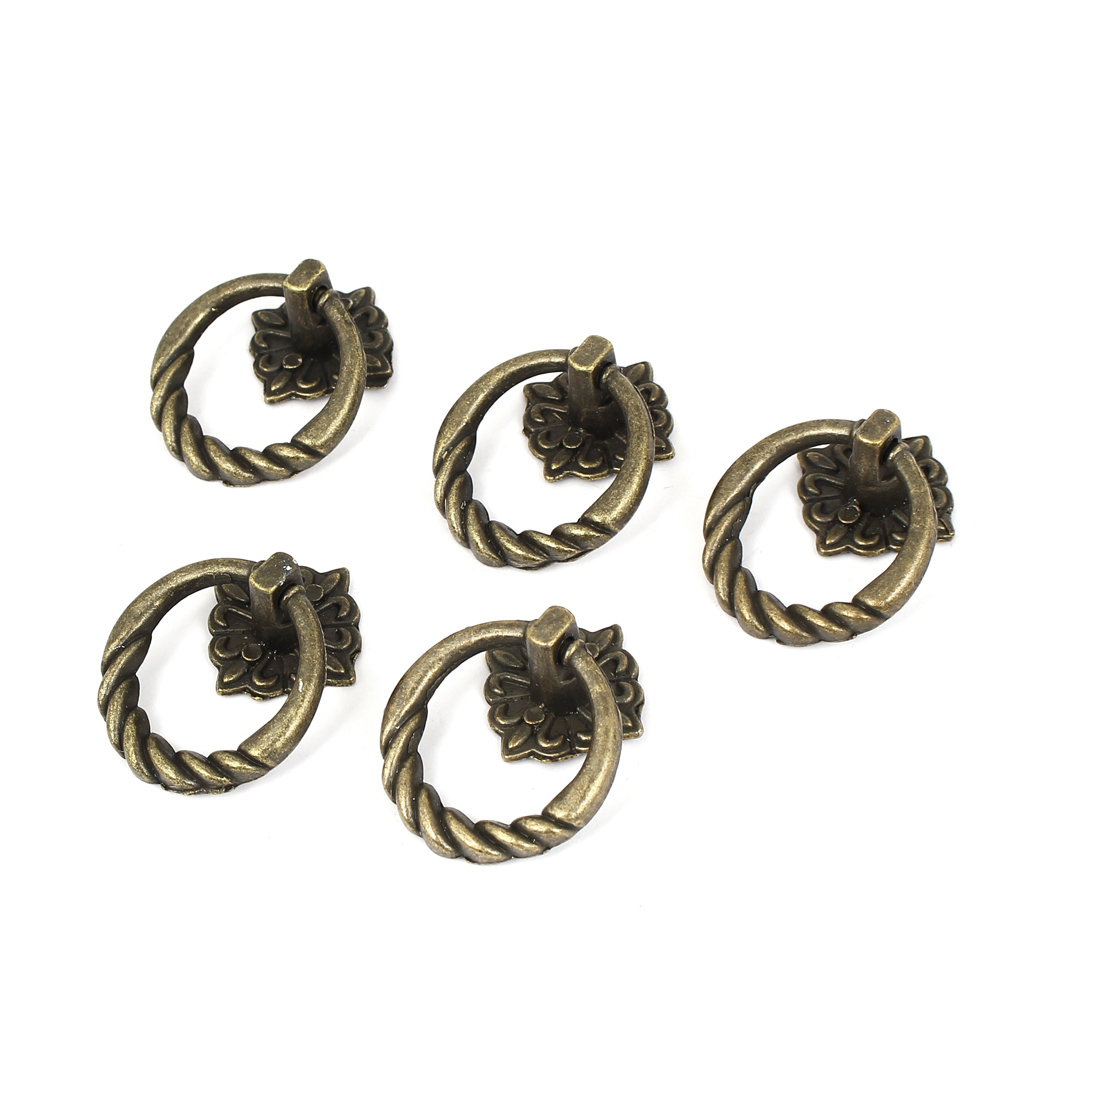 Cabinet Drawer Door Vintage Style Metal Pull Handle Ring Bronze Tone 5pcs